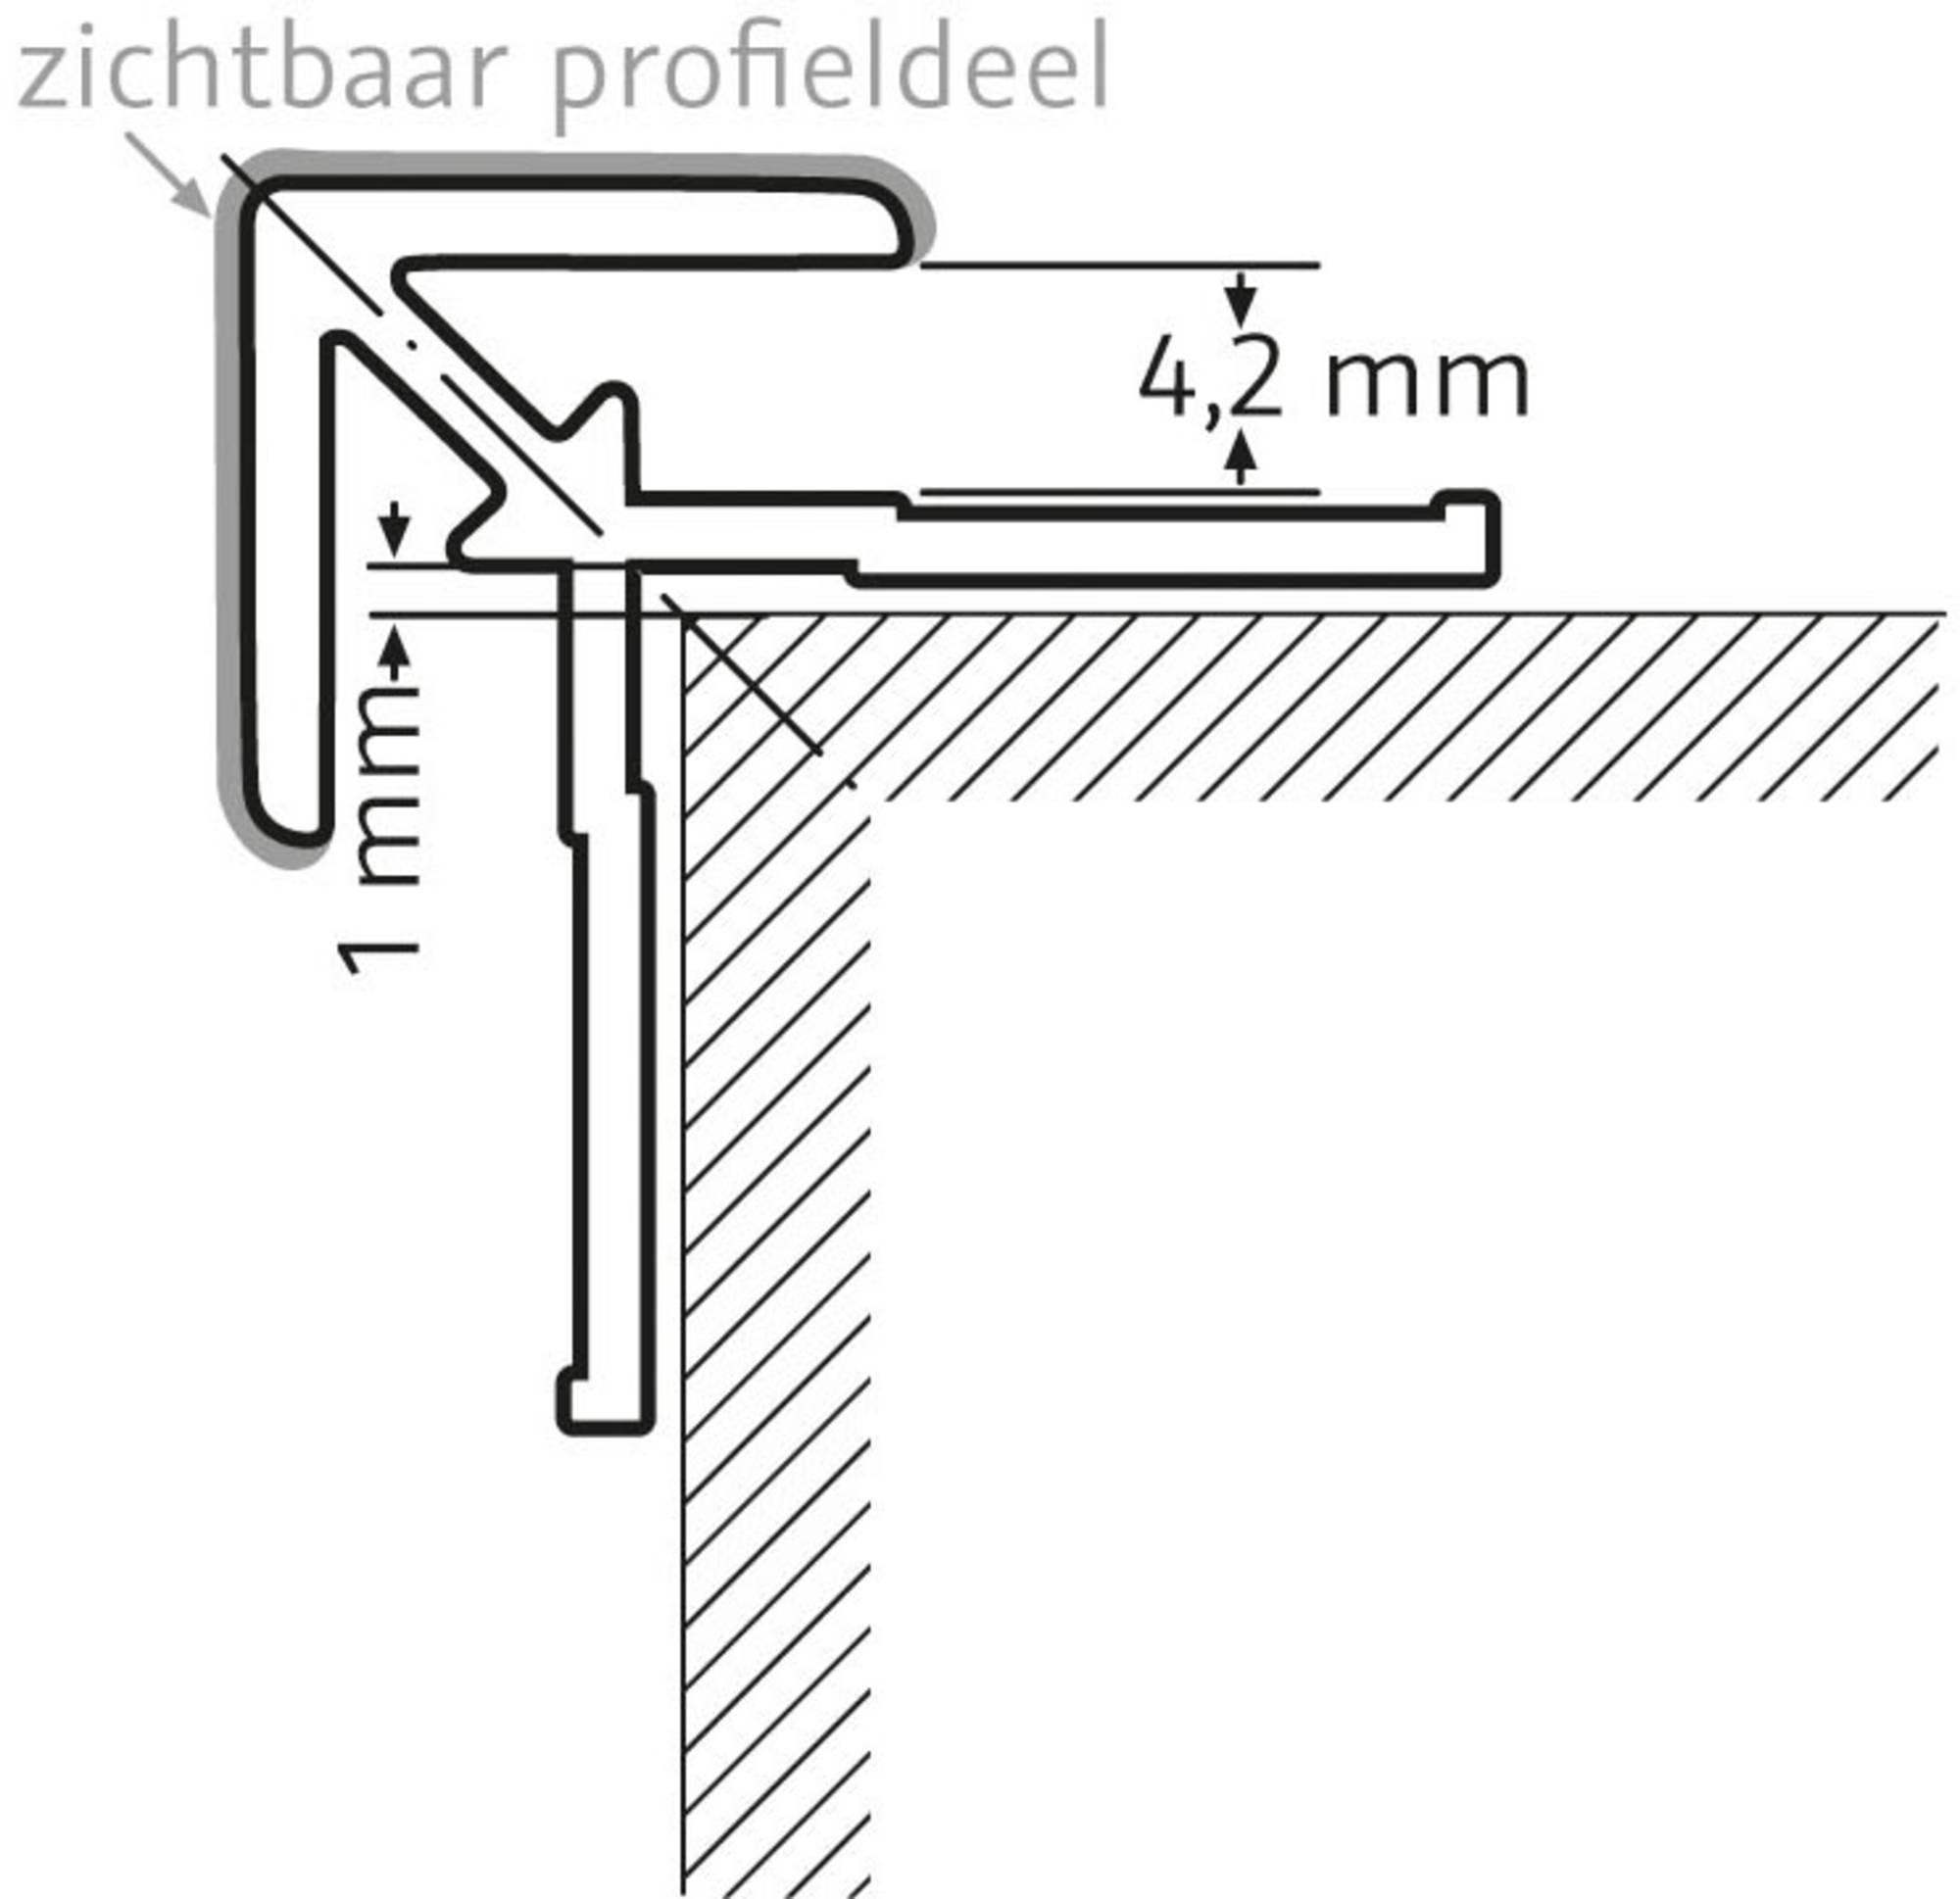 Duschprofi RenoDeco hoekprofiel 2,3x2,3 cm mat zwart